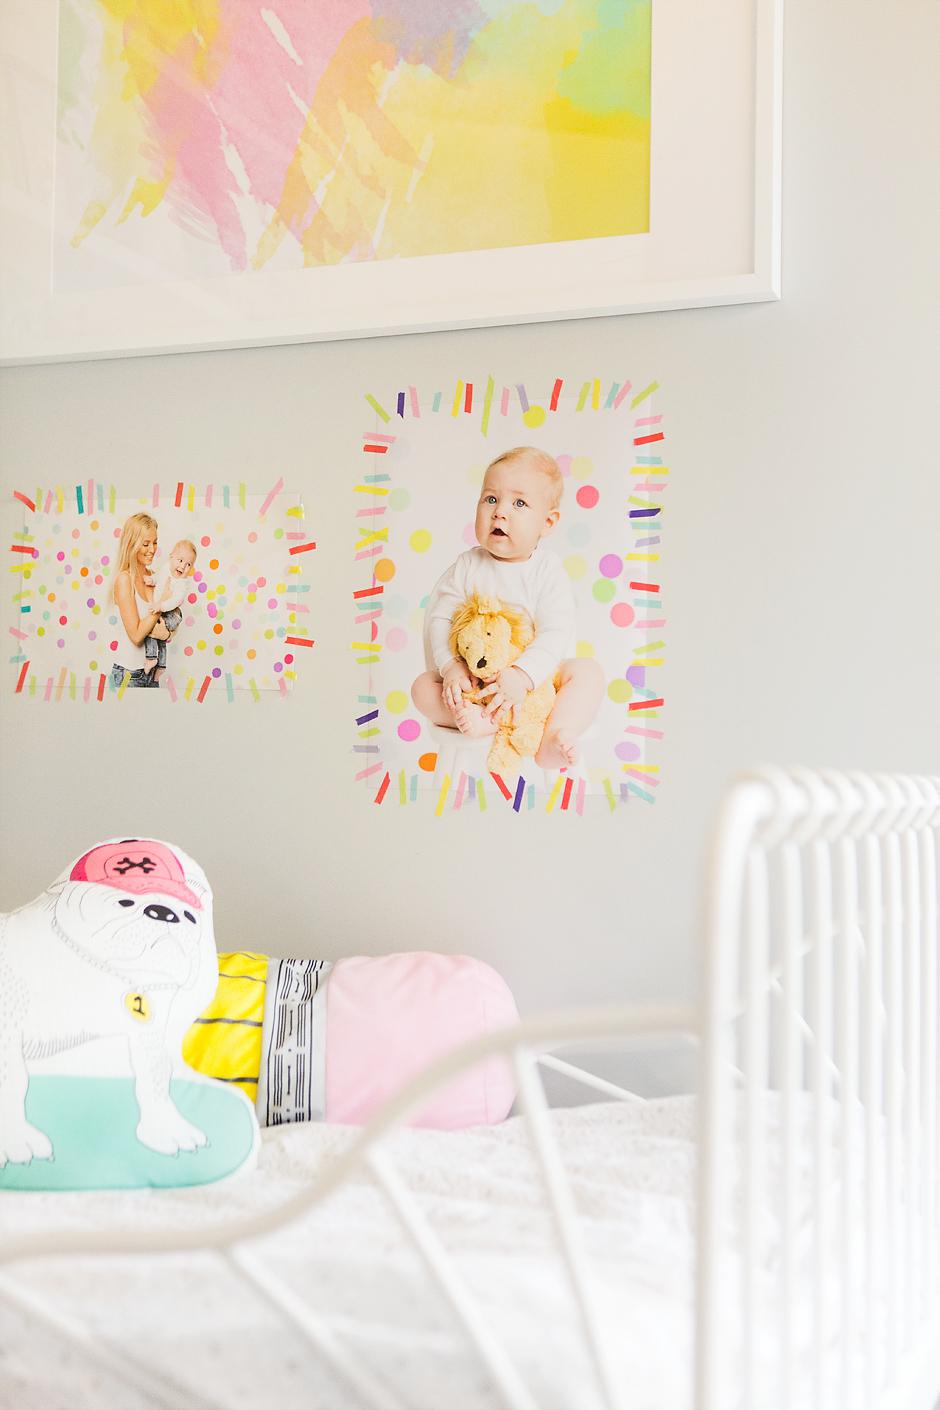 interiør-barnerom-blogg-kidsroom-pastell-fargerikt-haslien-foto-inspirasjon-unisex-barneinteriør_08